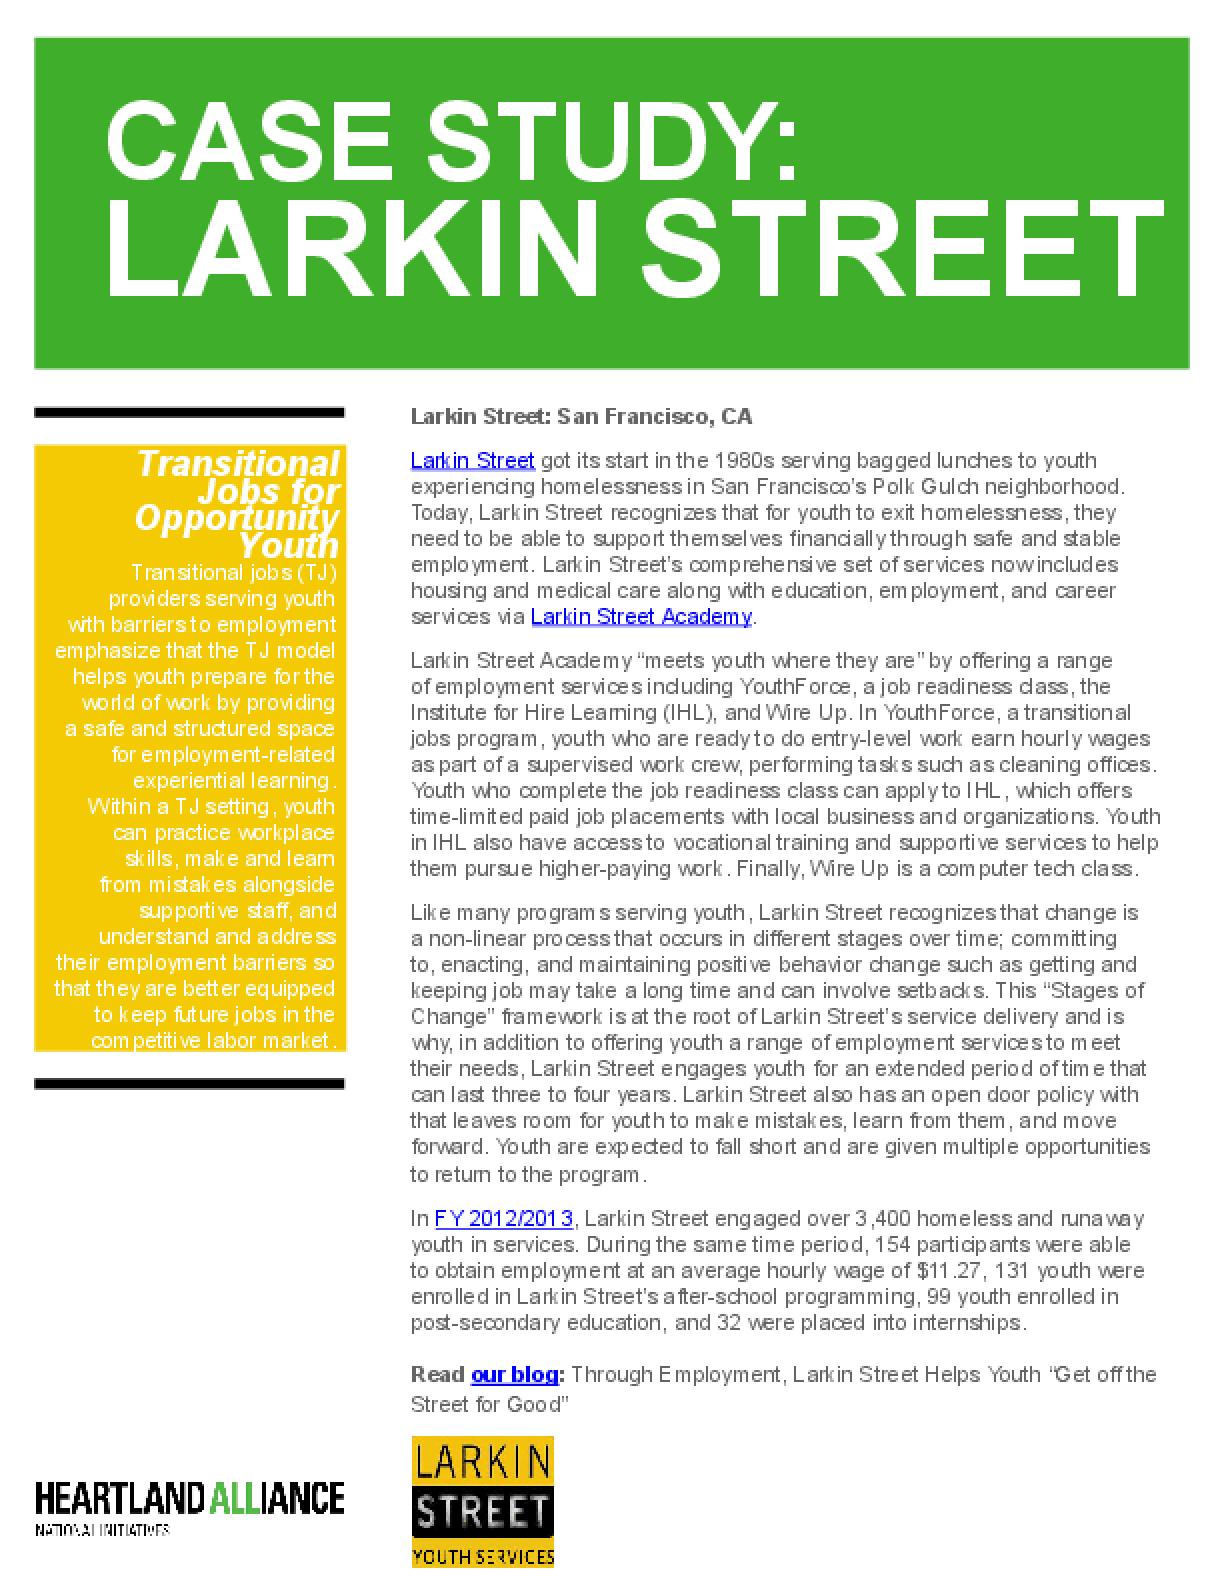 Opportunity Youth Employment Program Case Study: Larkin Street